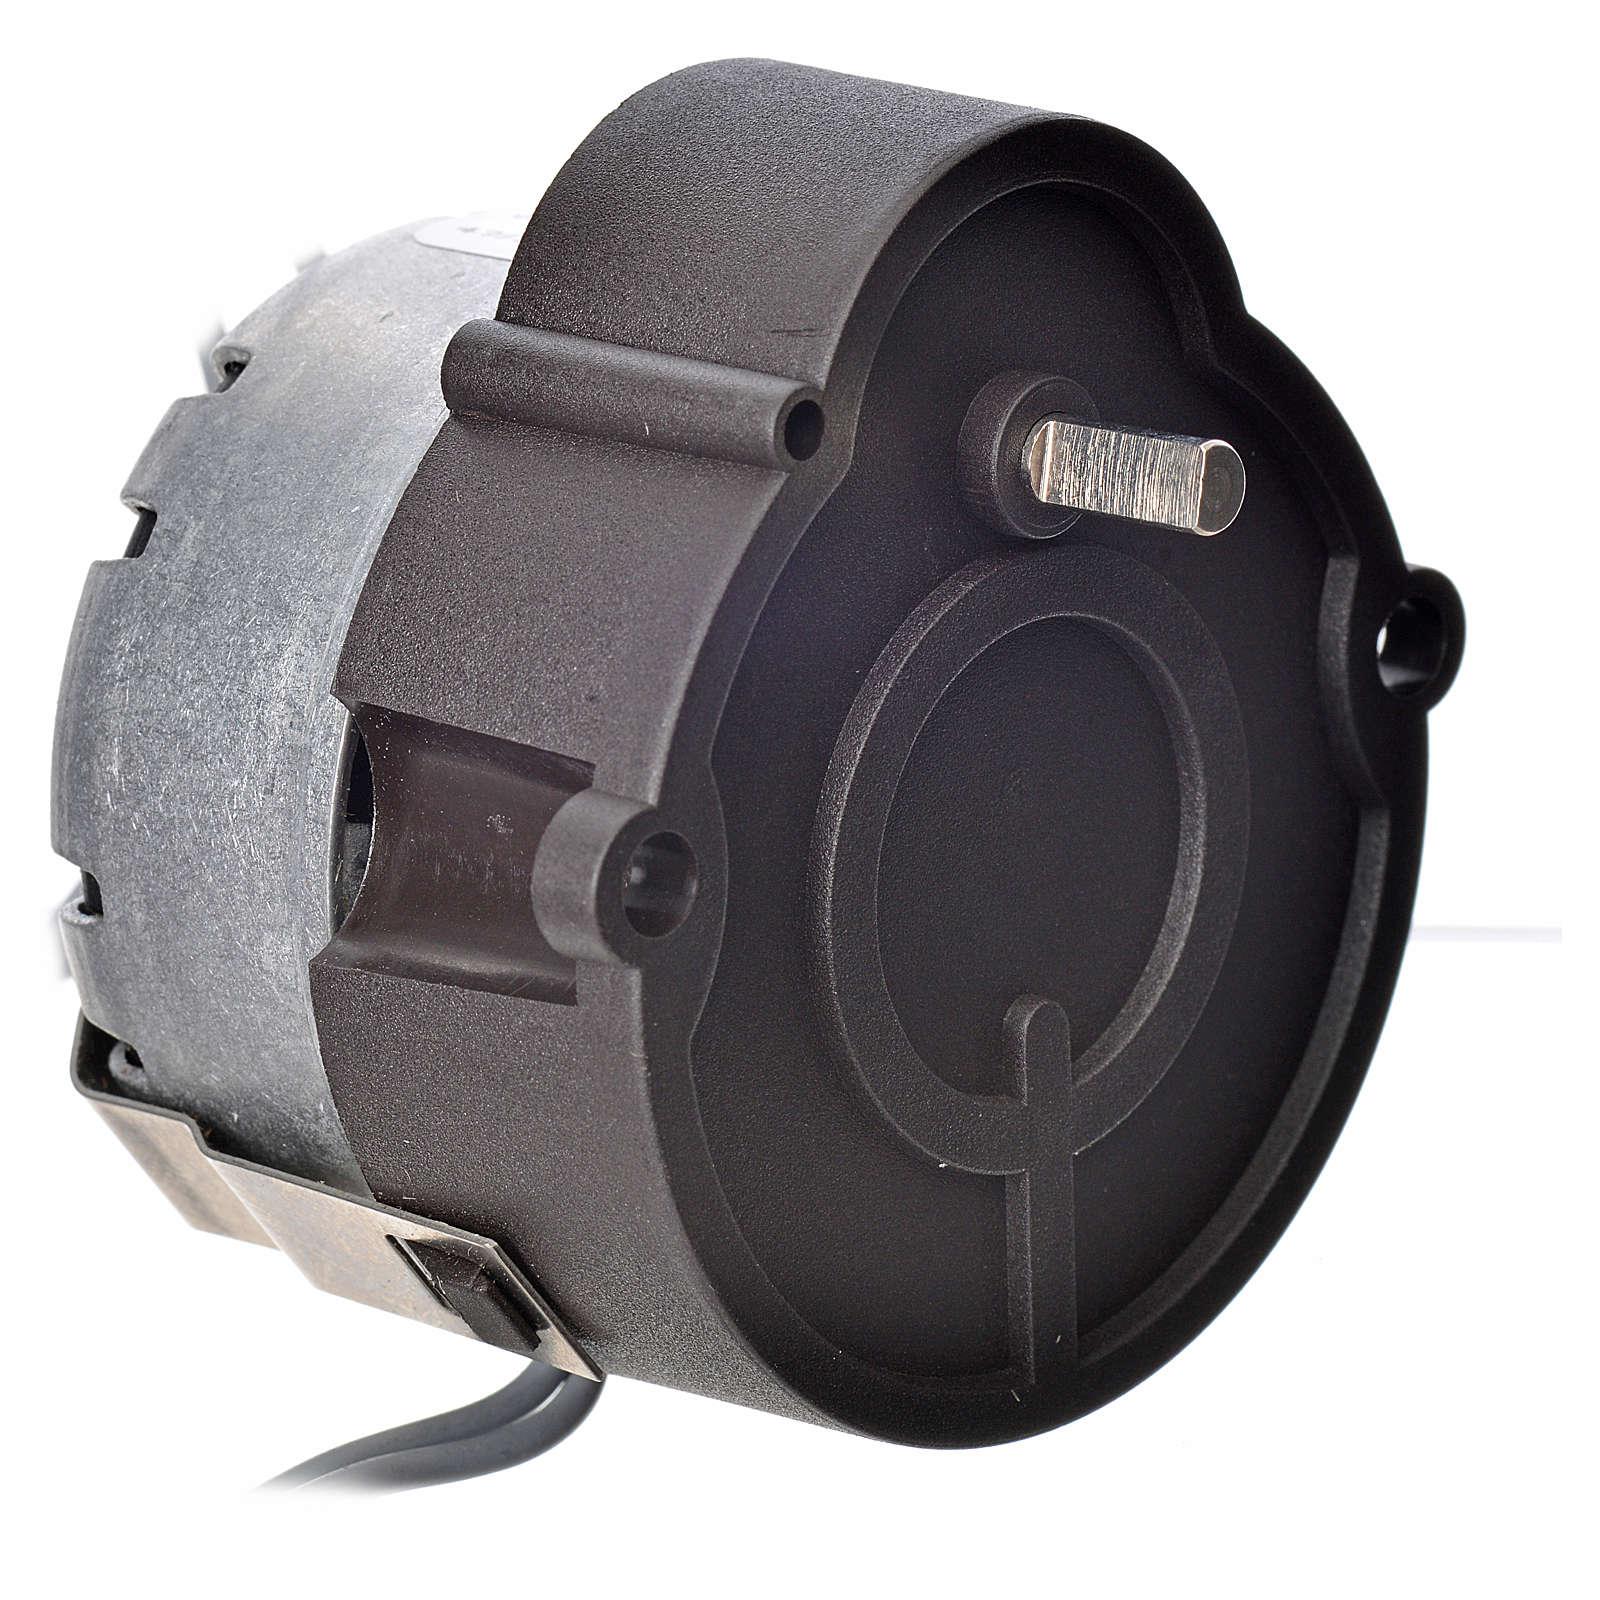 Nativity accessory, MR gear motor, 2 t/m 4